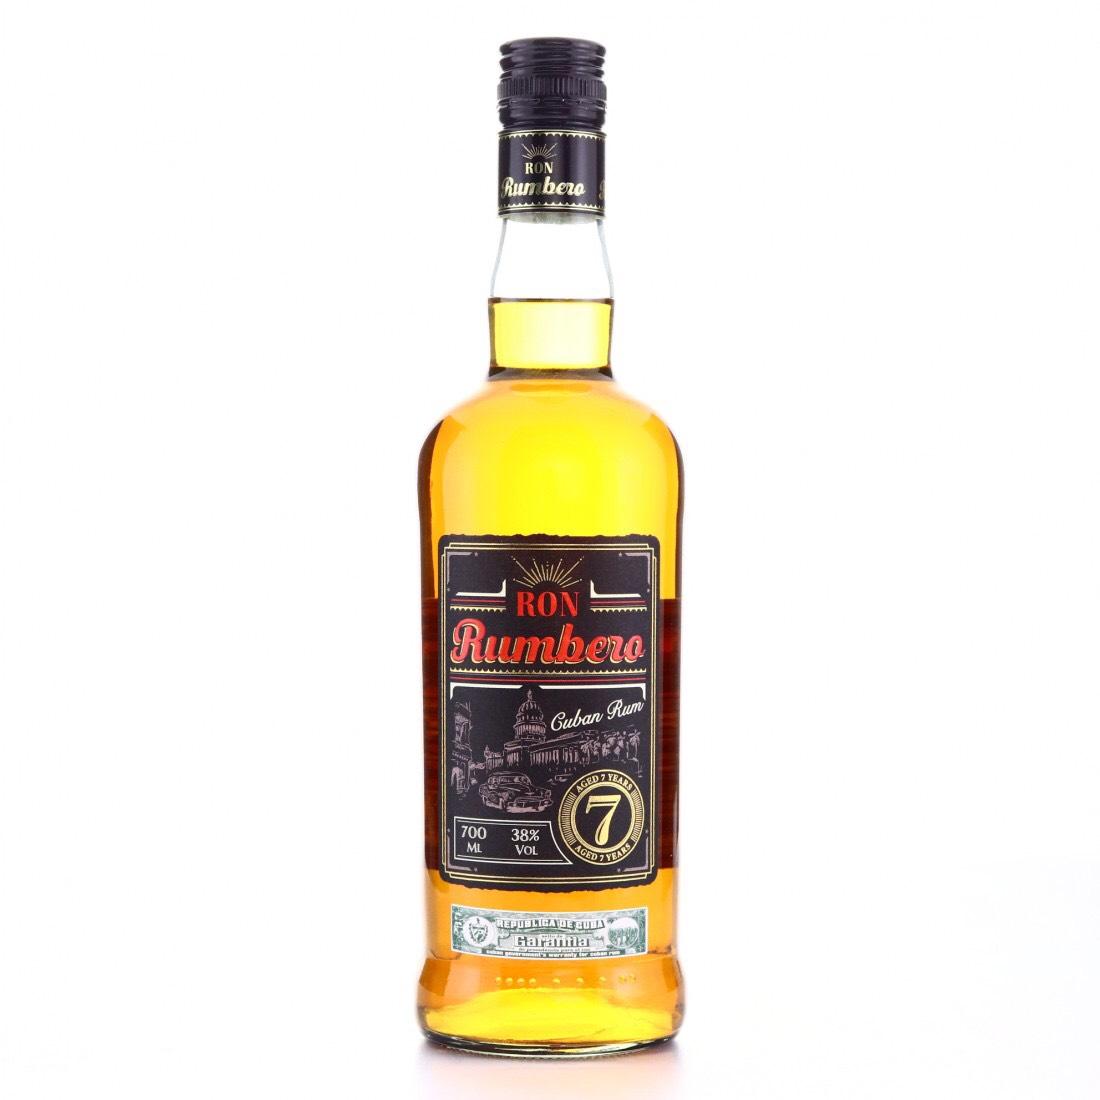 Bottle image of 7 Years